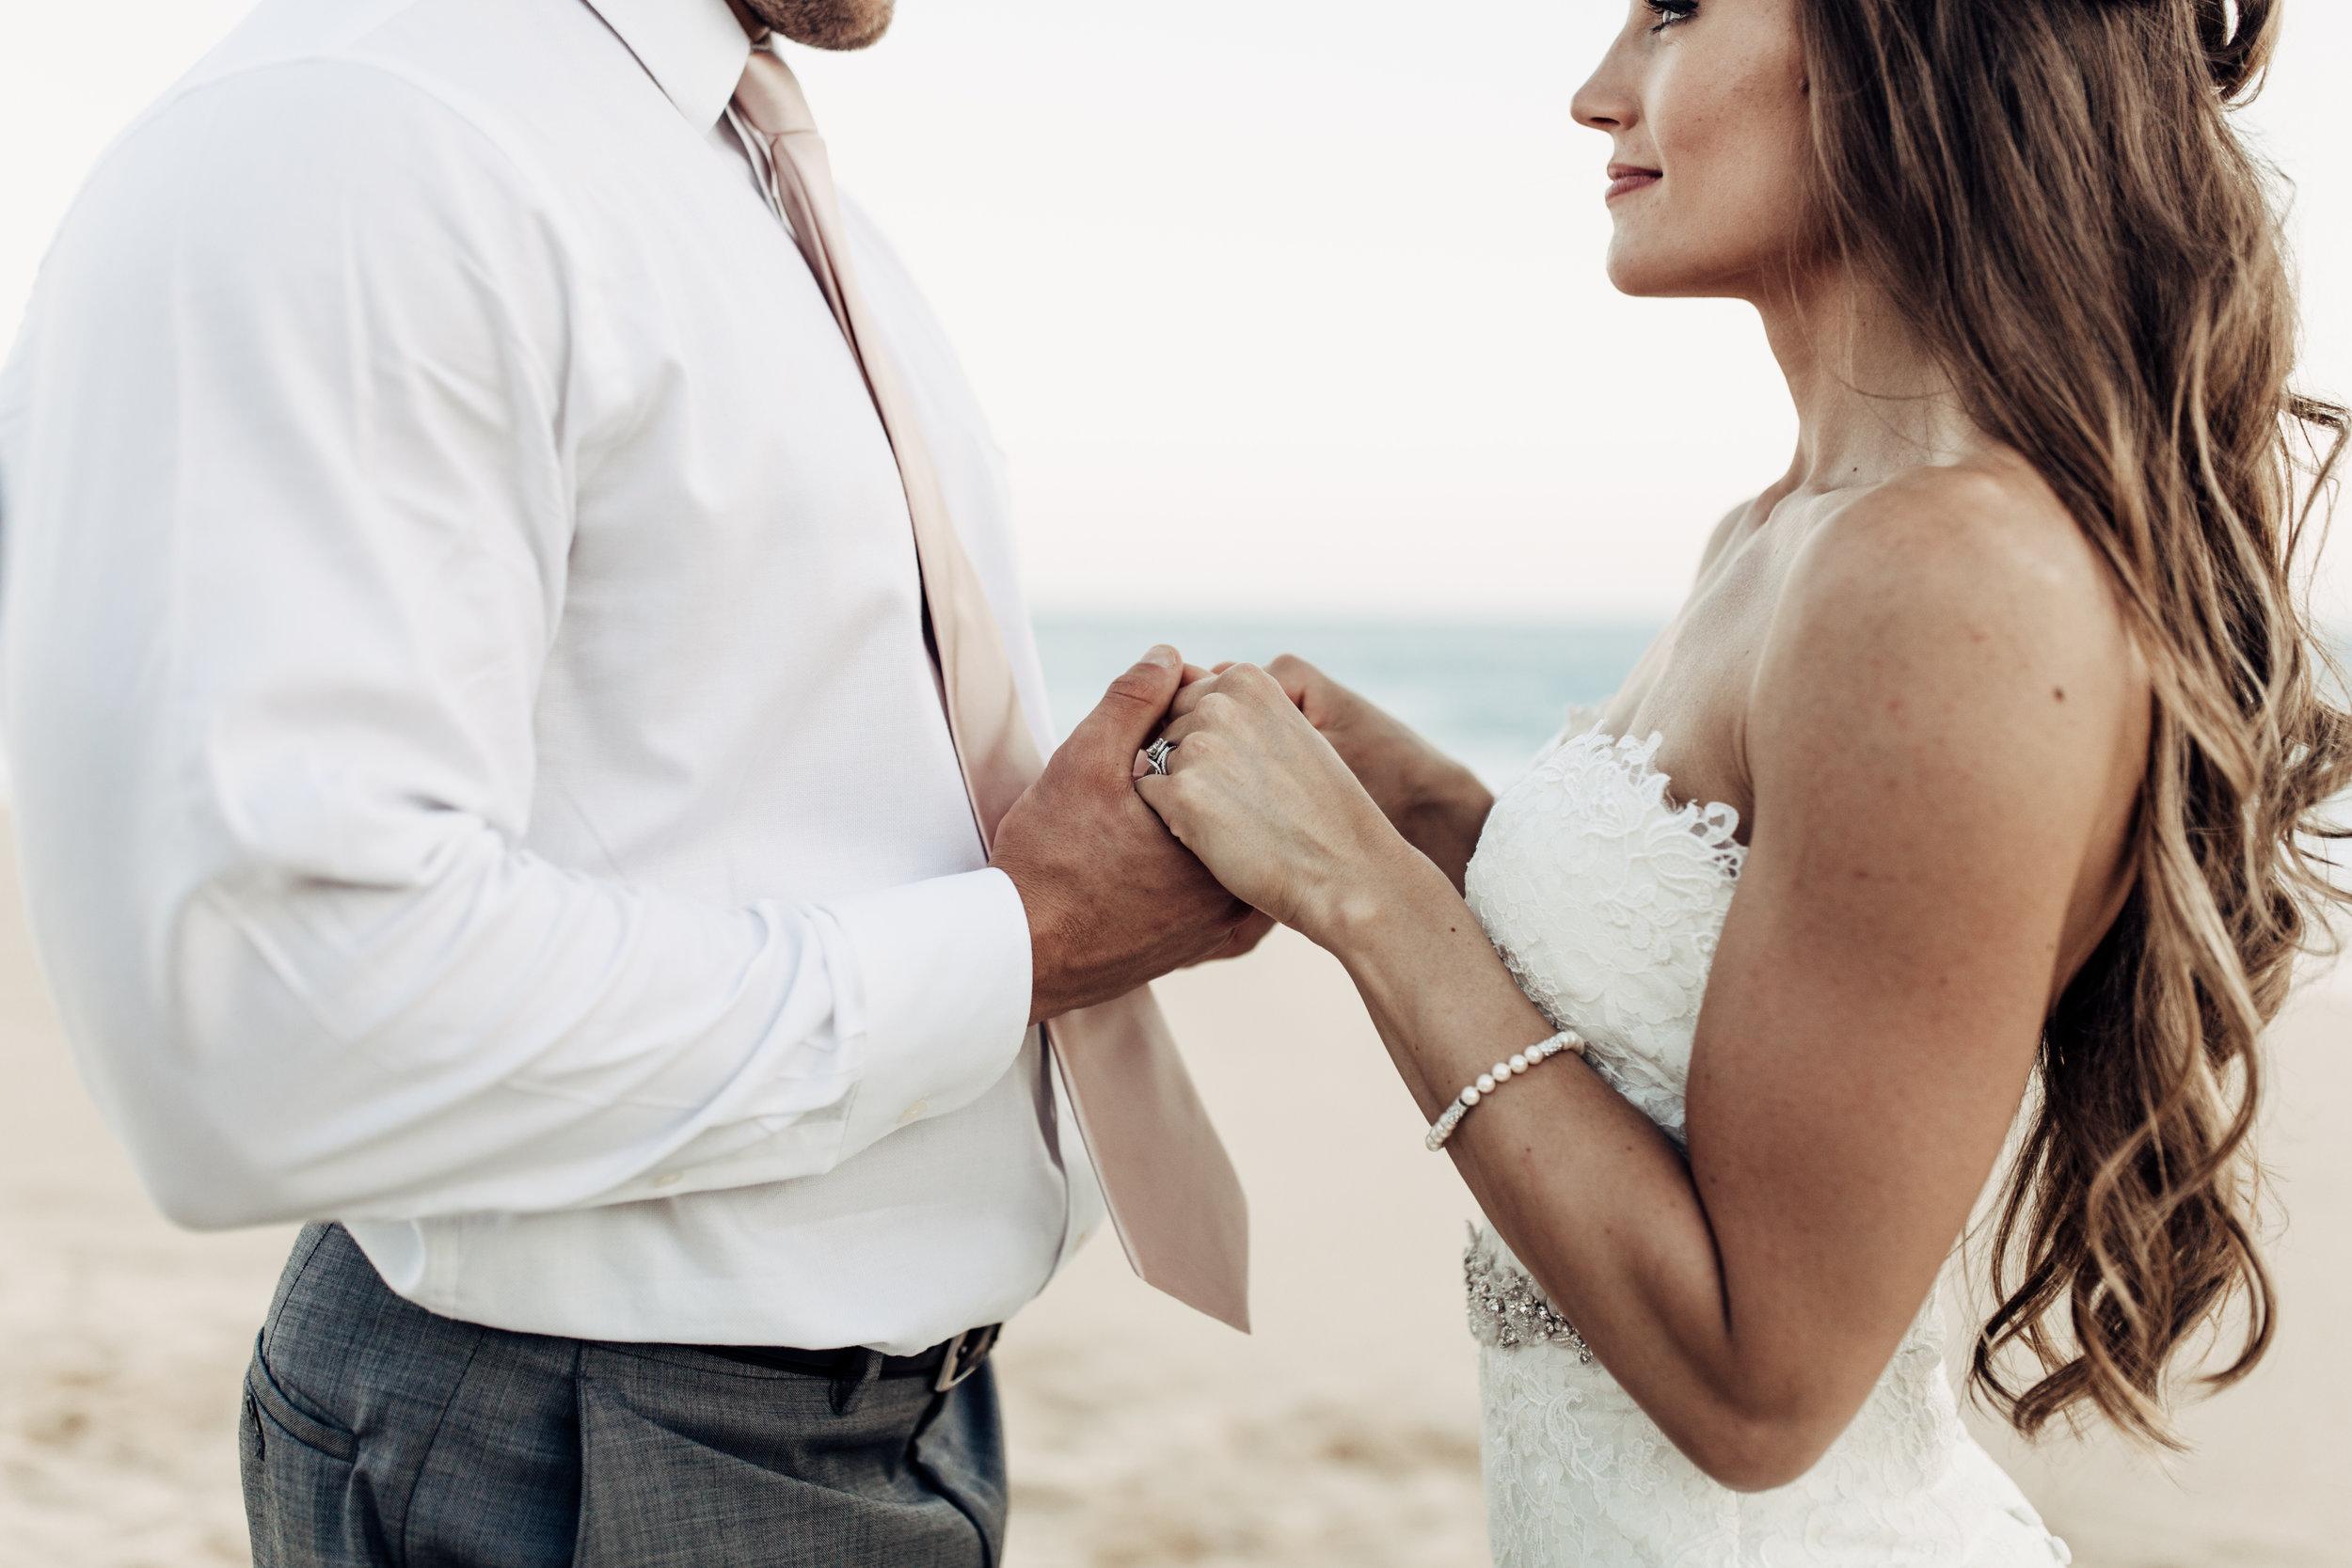 pueblo-bonito-sunset-beach-wedding-cabo-san-lucas559.jpg